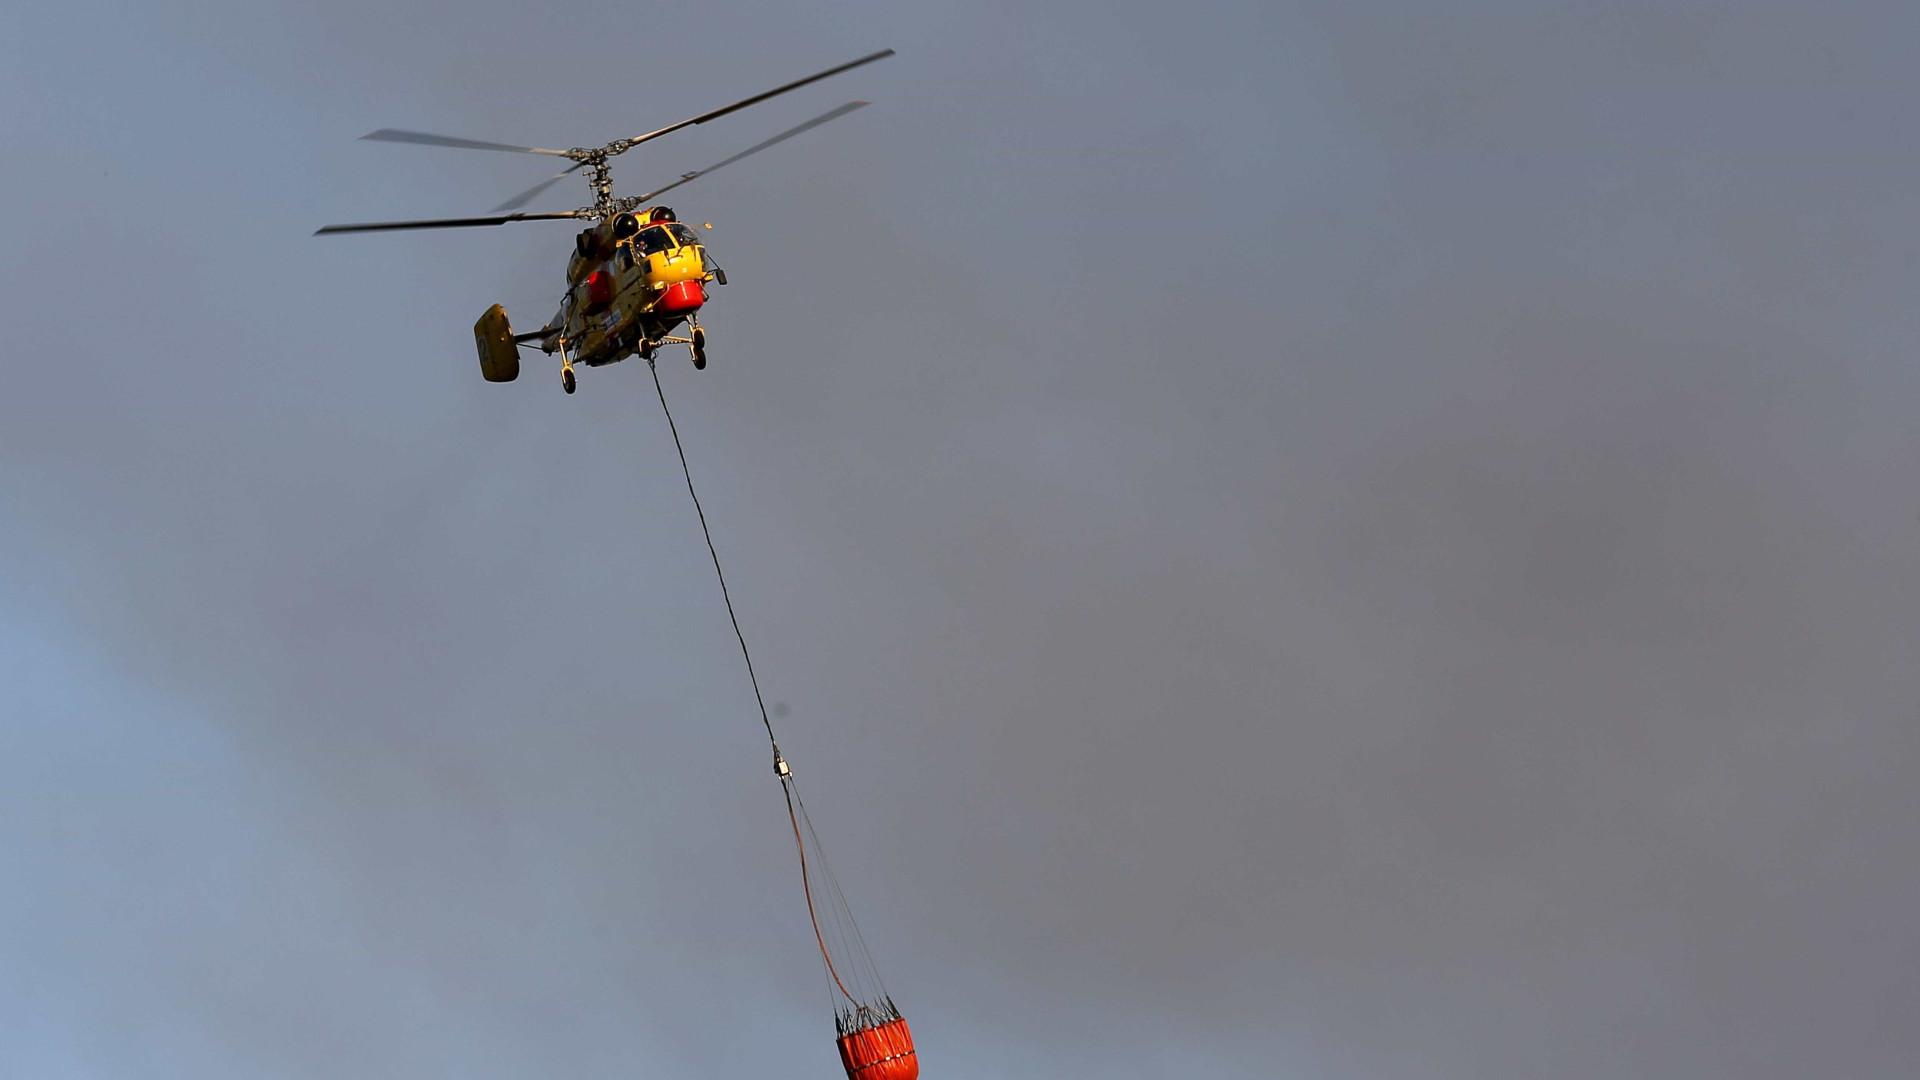 Kamov vão ser substituídos por outros helicópteros pesados